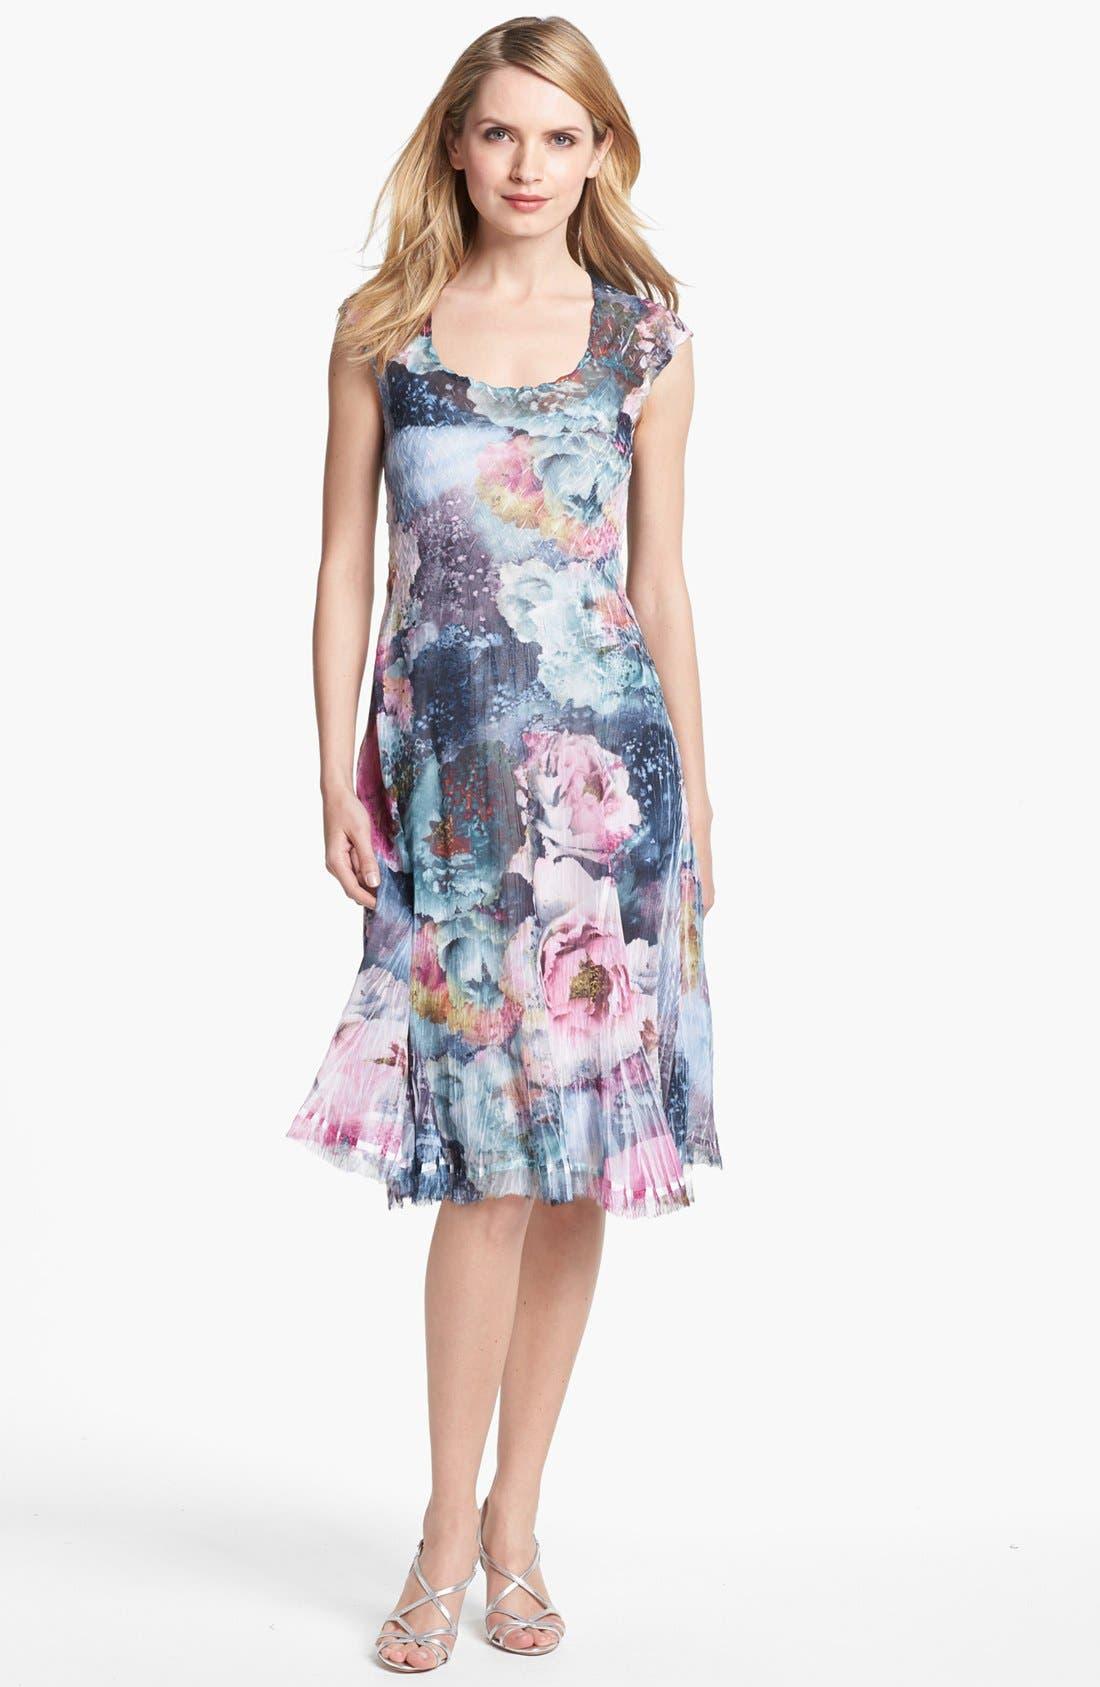 Alternate Image 1 Selected - Komarov Scoop Neck Print Chiffon Dress (Petite)